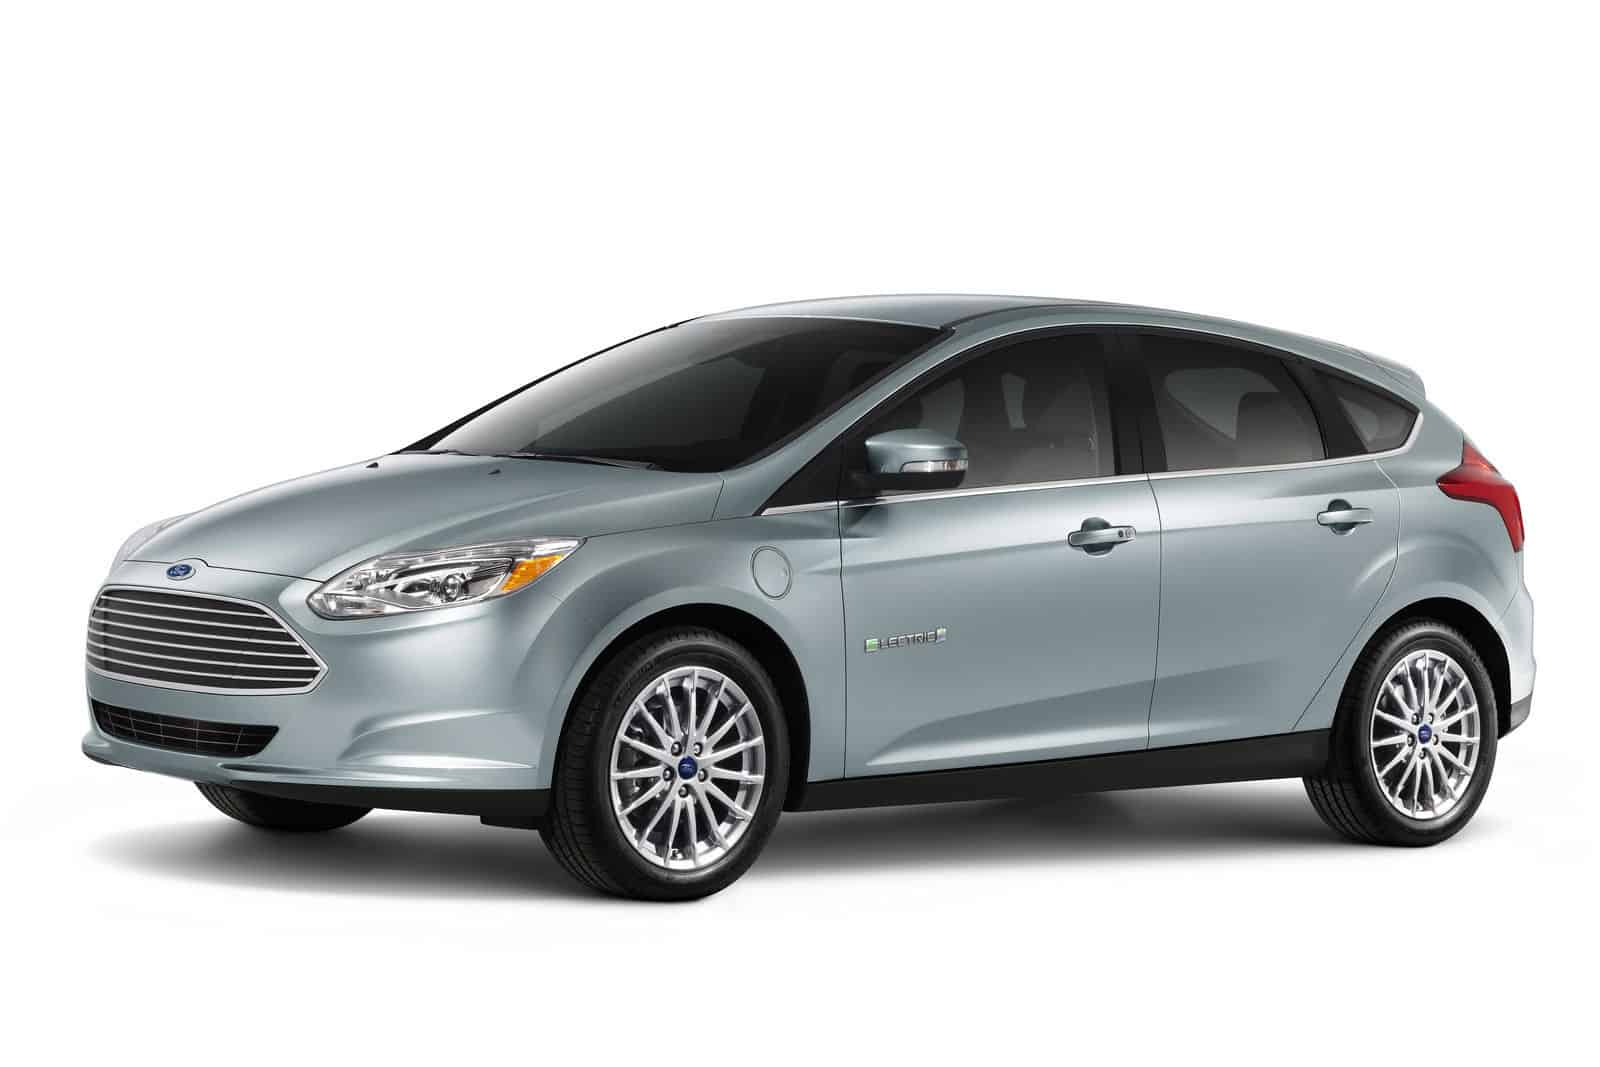 2012 Ford Focus EV